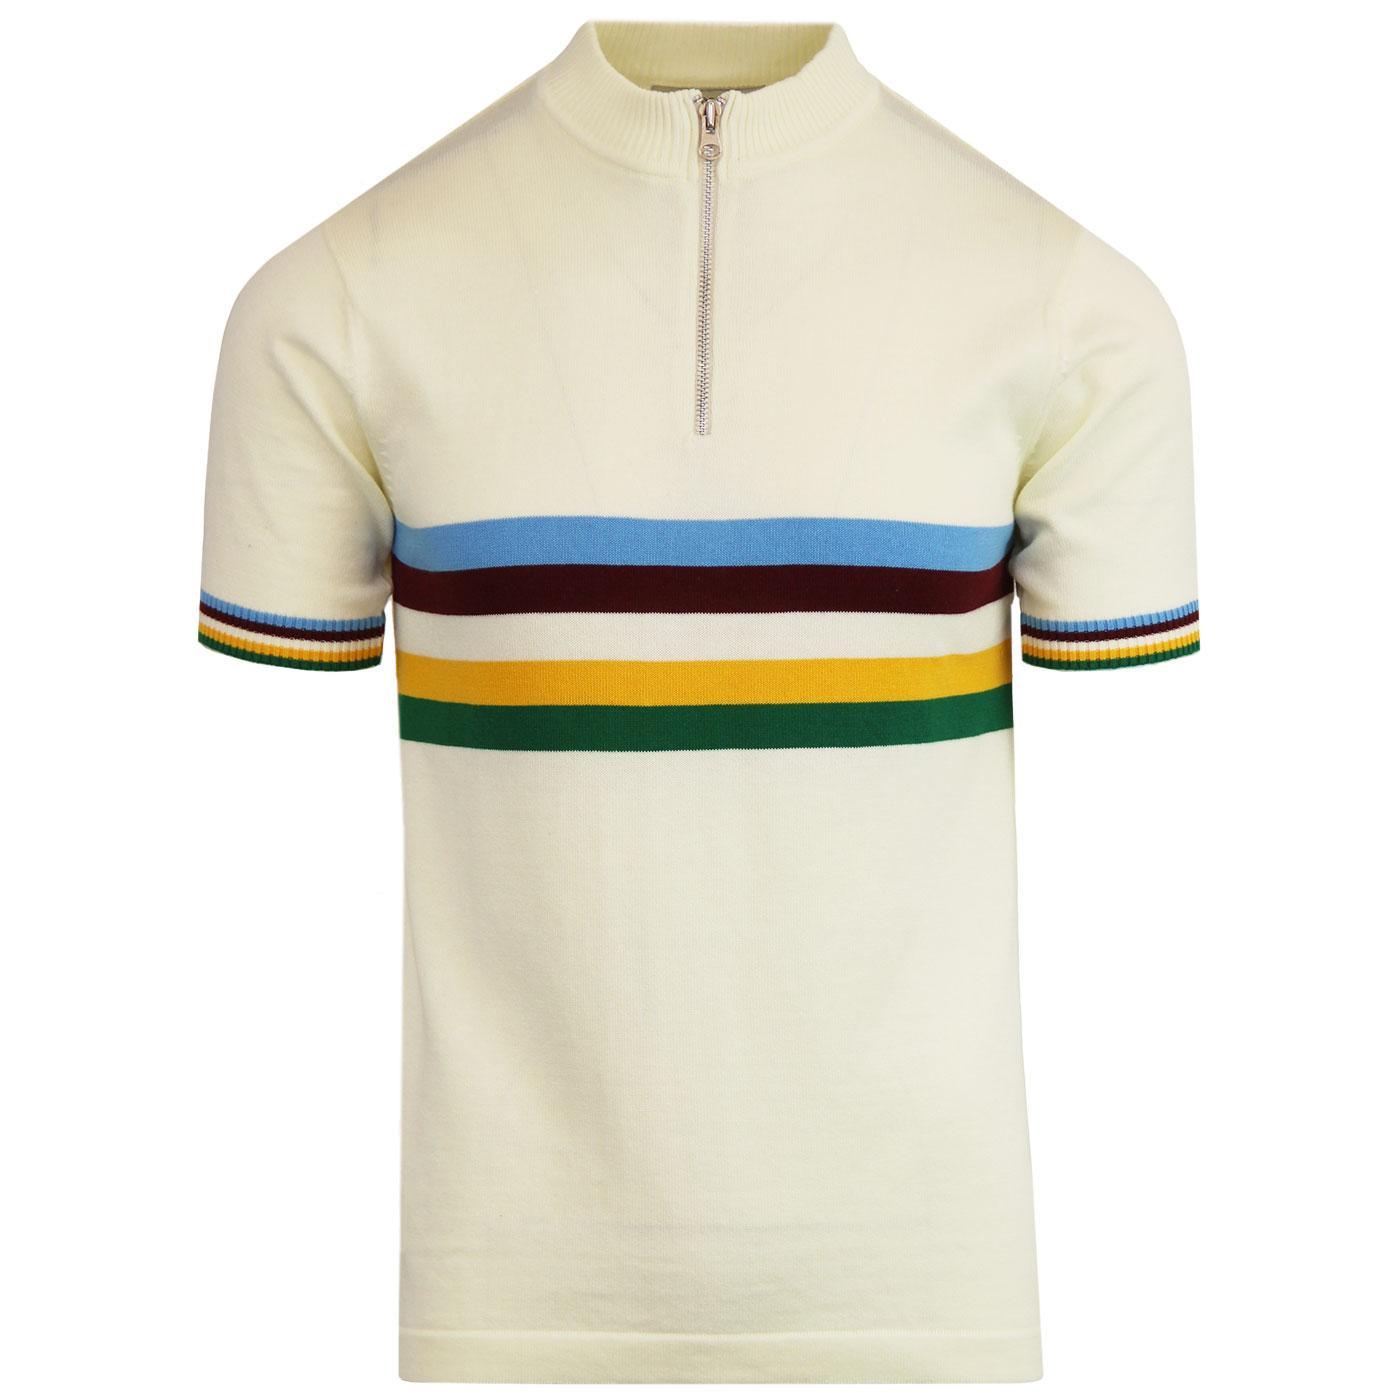 Velo MADCAP ENGLAND Rainbow Stripe Cycling Top WW